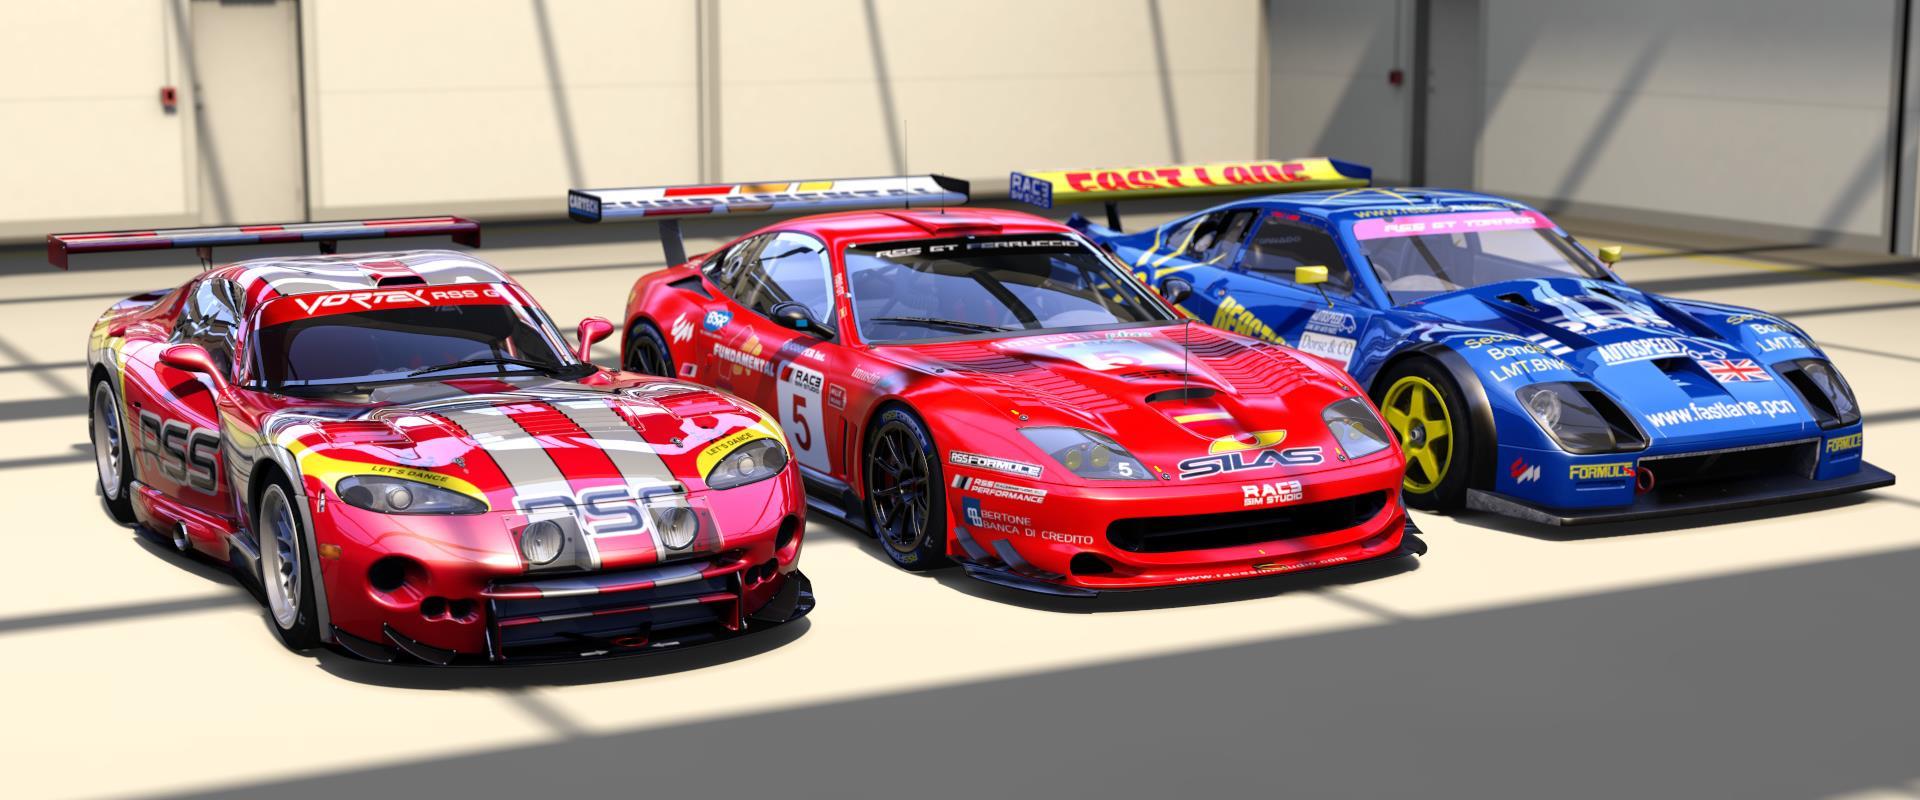 RSS GT Mod release date - Saturday 23rd - RaceSimStudio